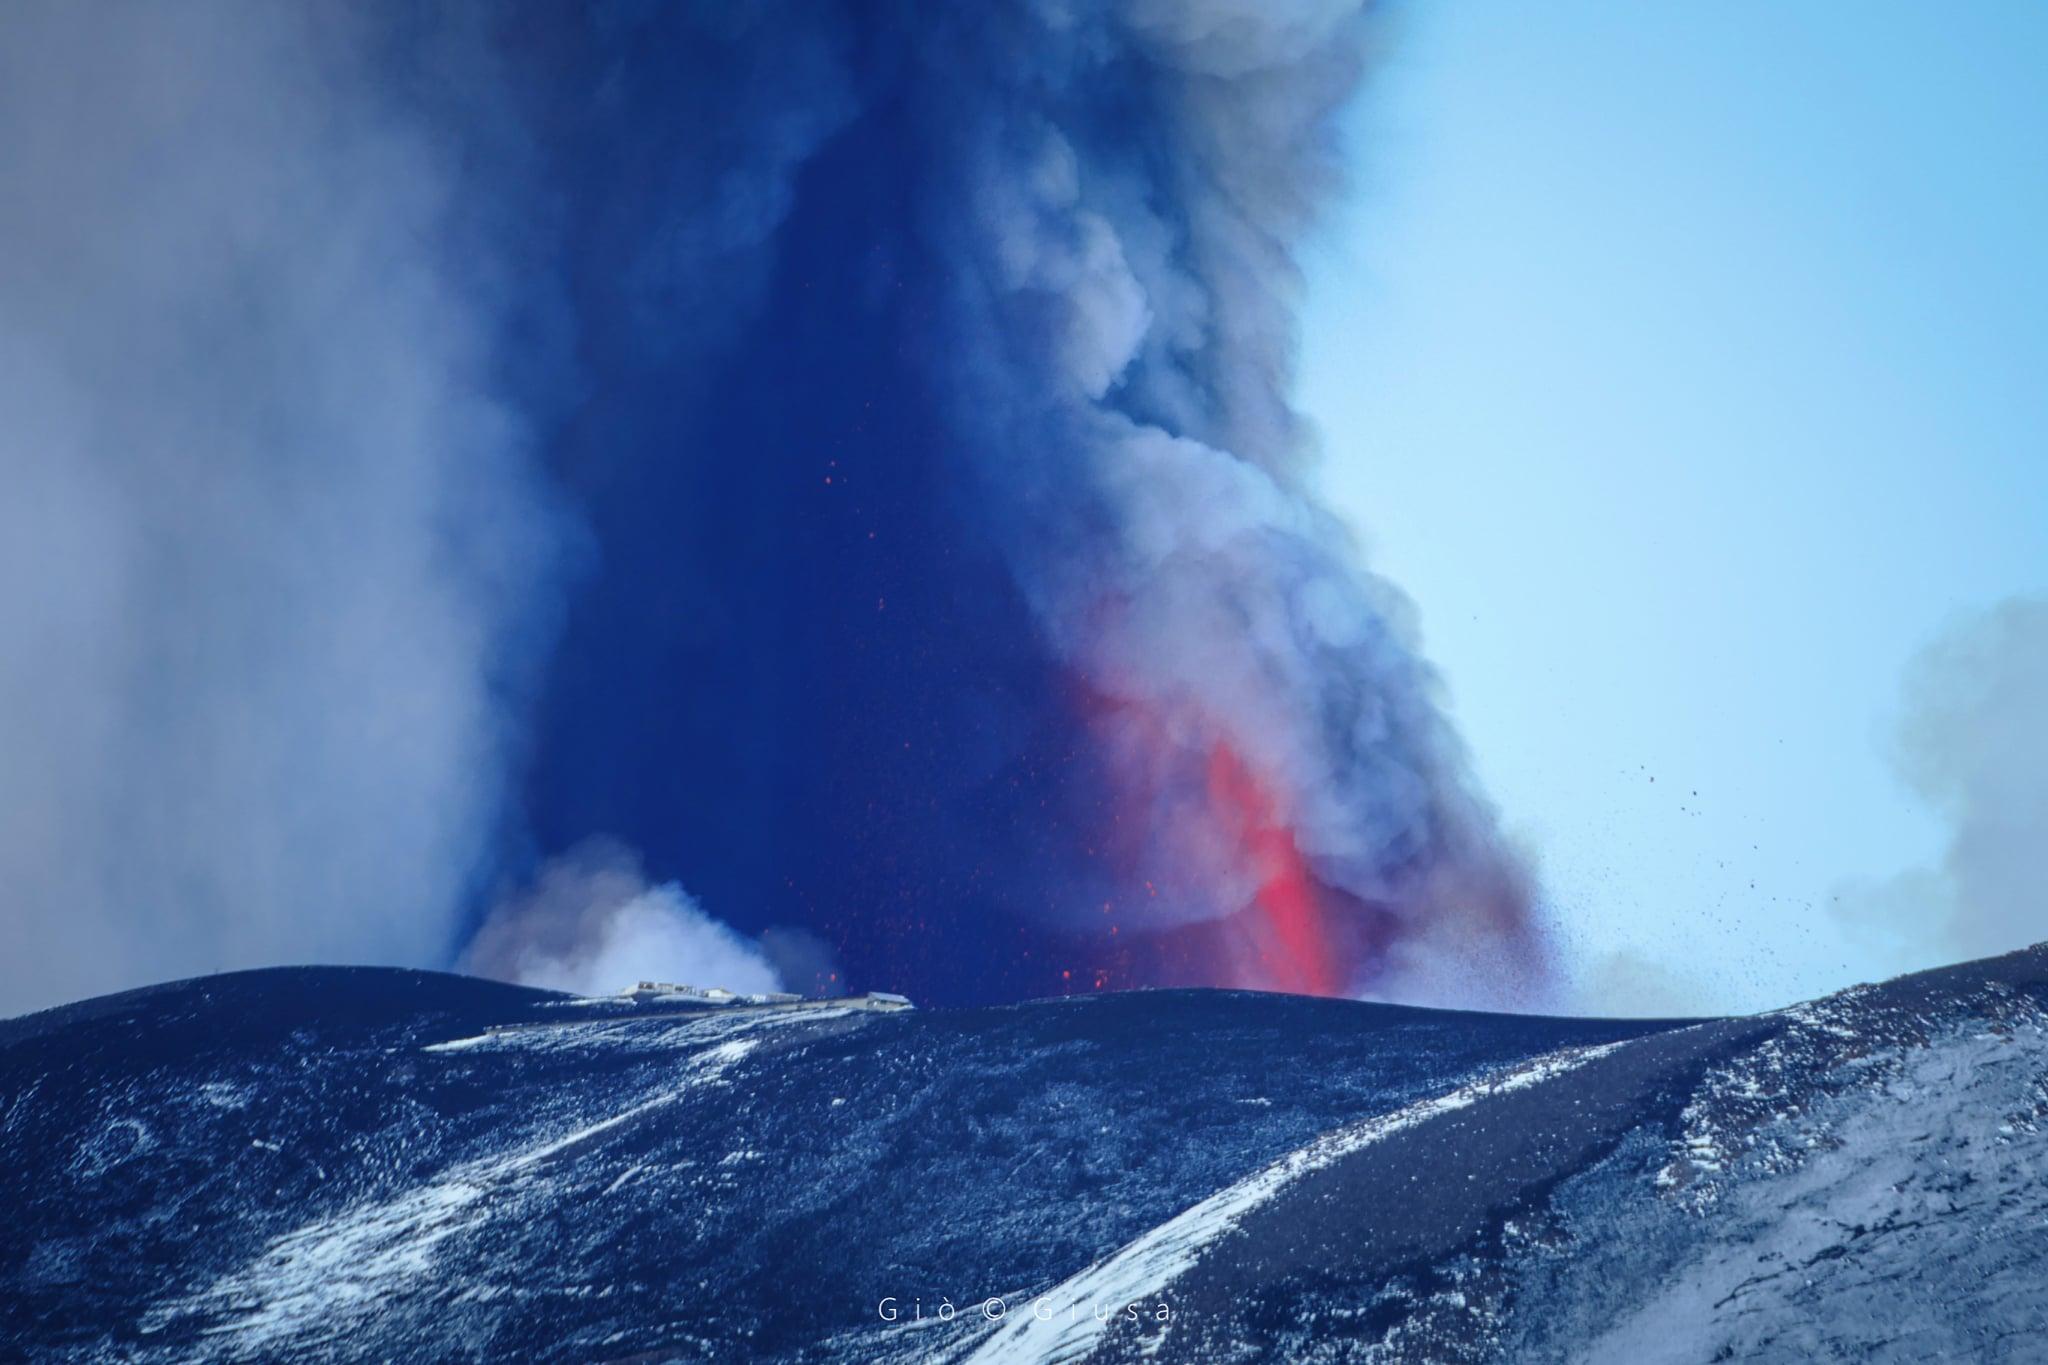 13 Mars 2021 . FR . Italie / Sicile : Etna , Islande : Péninsule de Reykjanes , Kamchatka : Klyuchevskoy , Philippines : Taal , Hawaii : Kilauea .